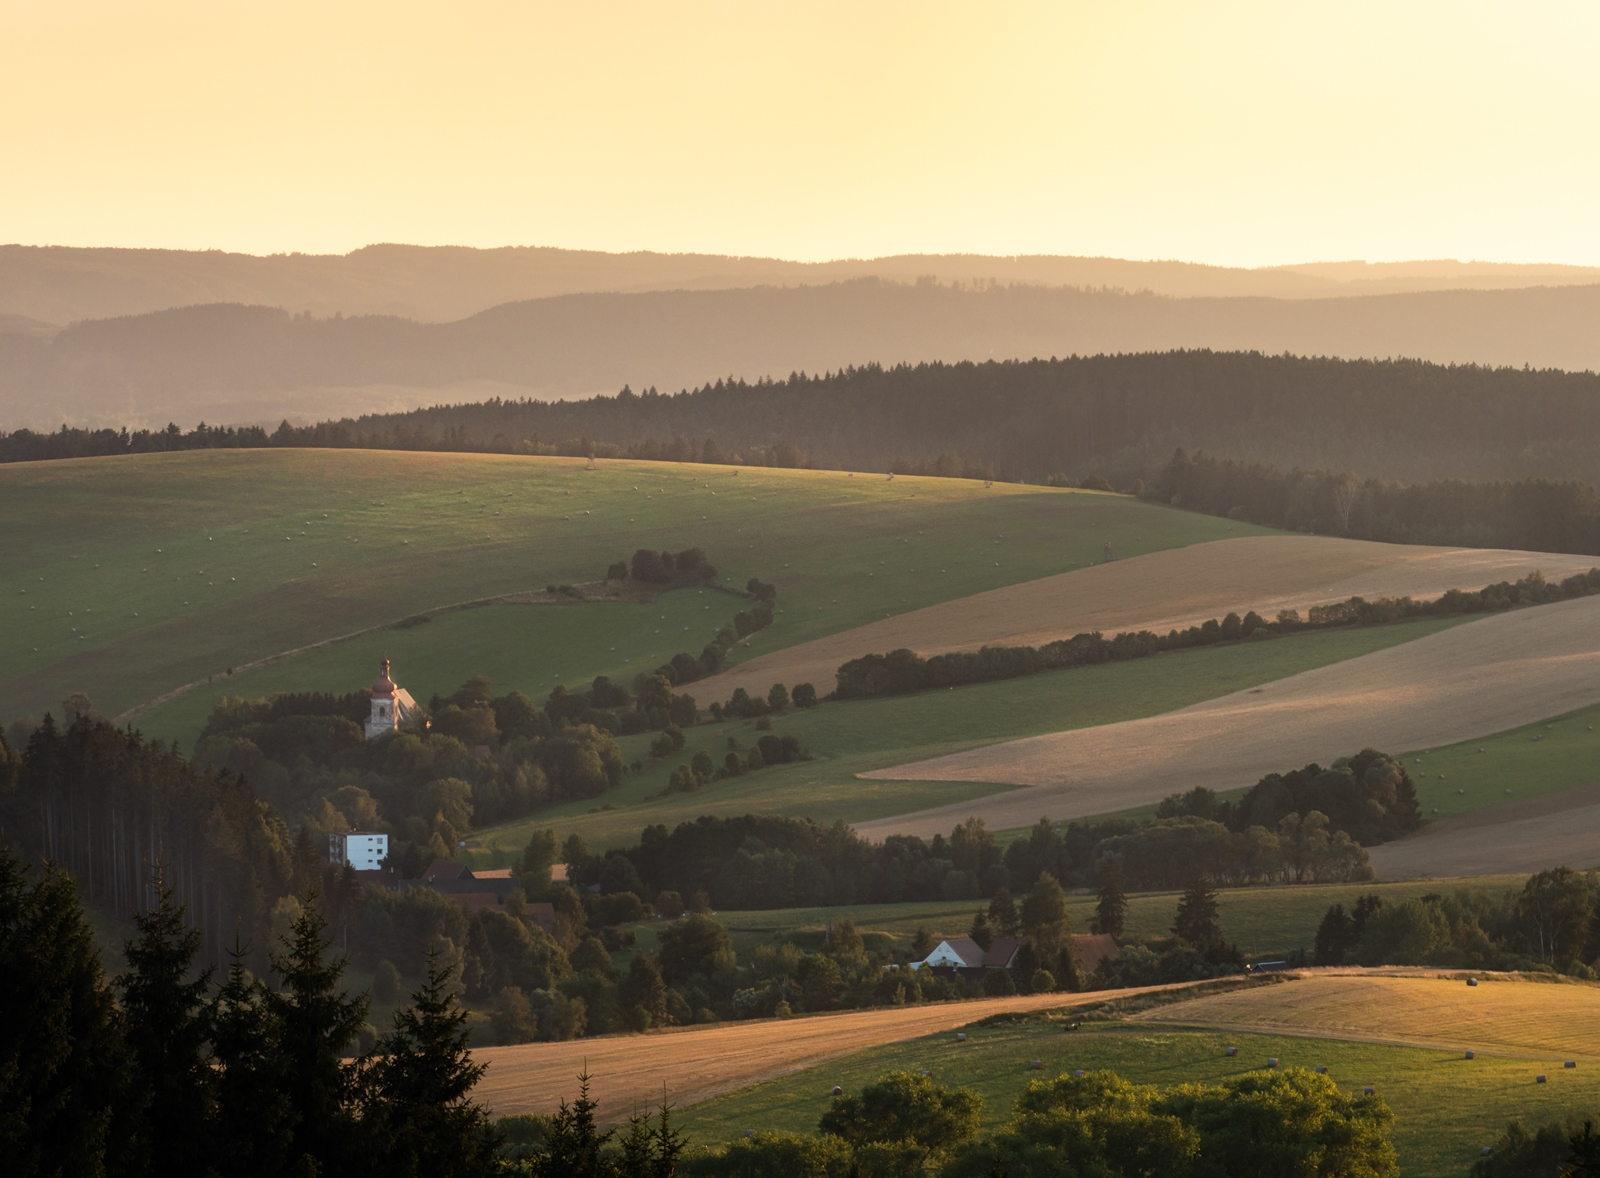 Landscape of Broumov, Czech Republic